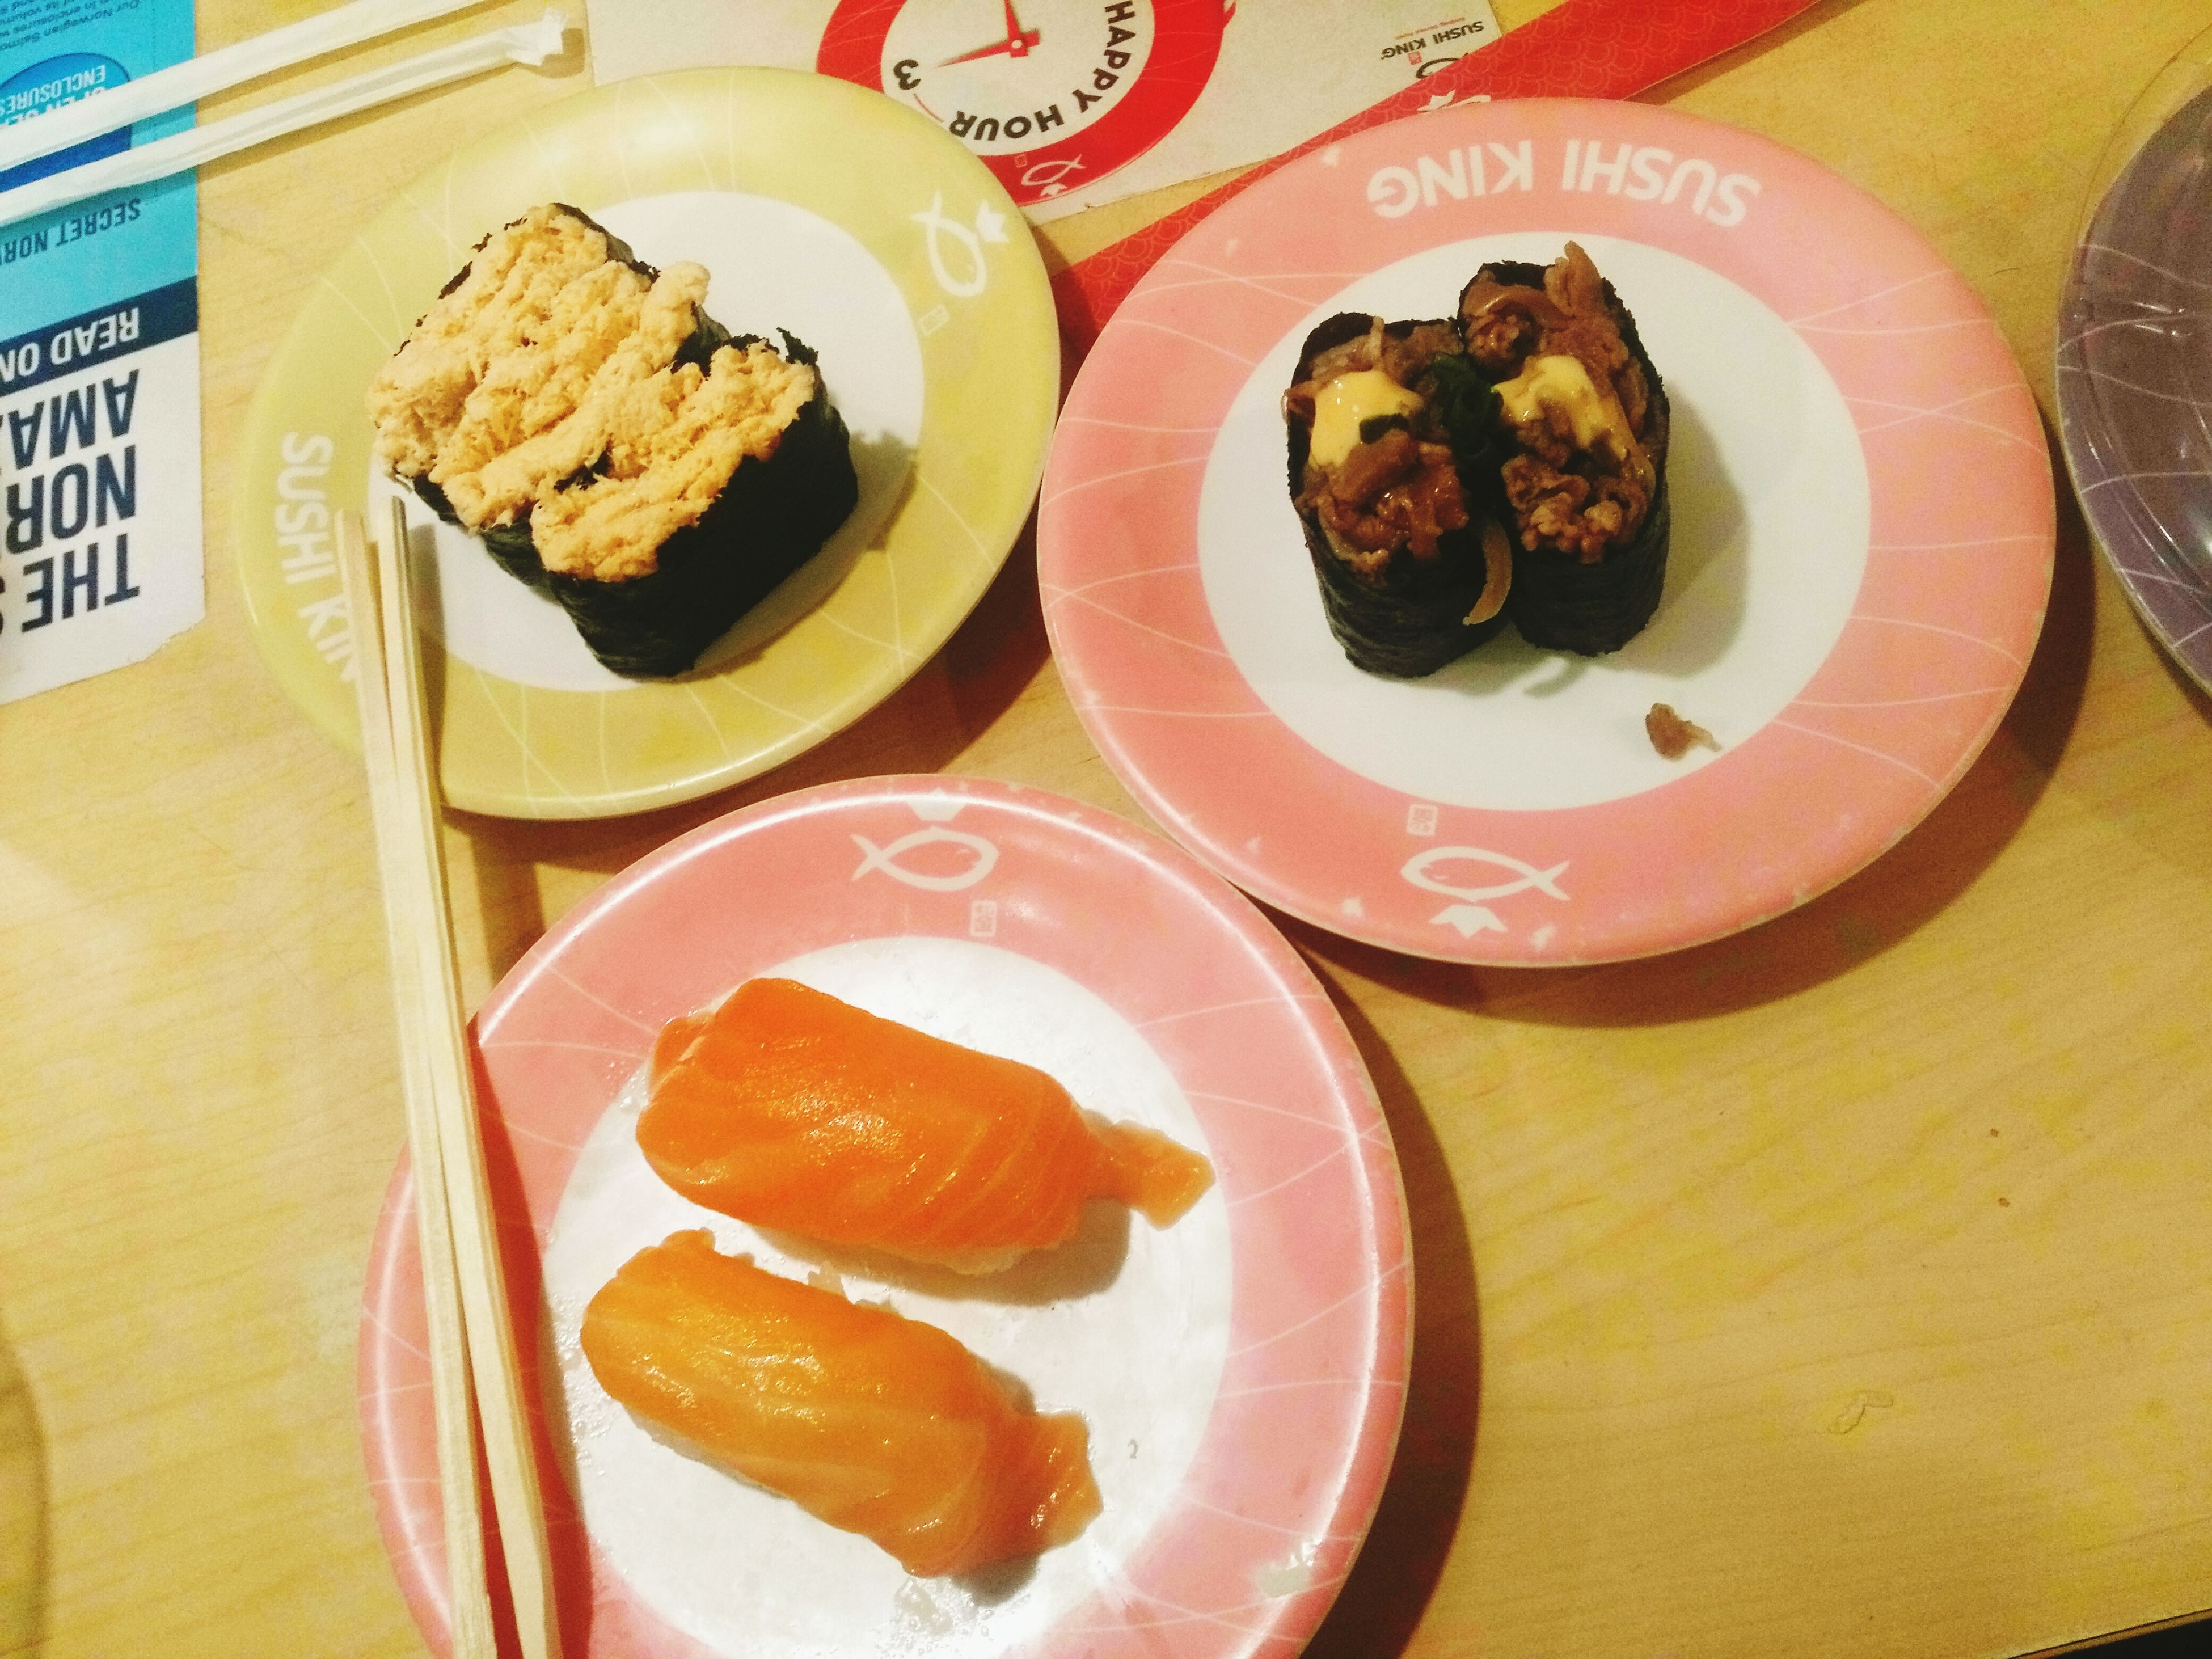 One of my favourite food. Food And Drink Sushilover Sushi Food Plate Sushiking Sushikingbonanza